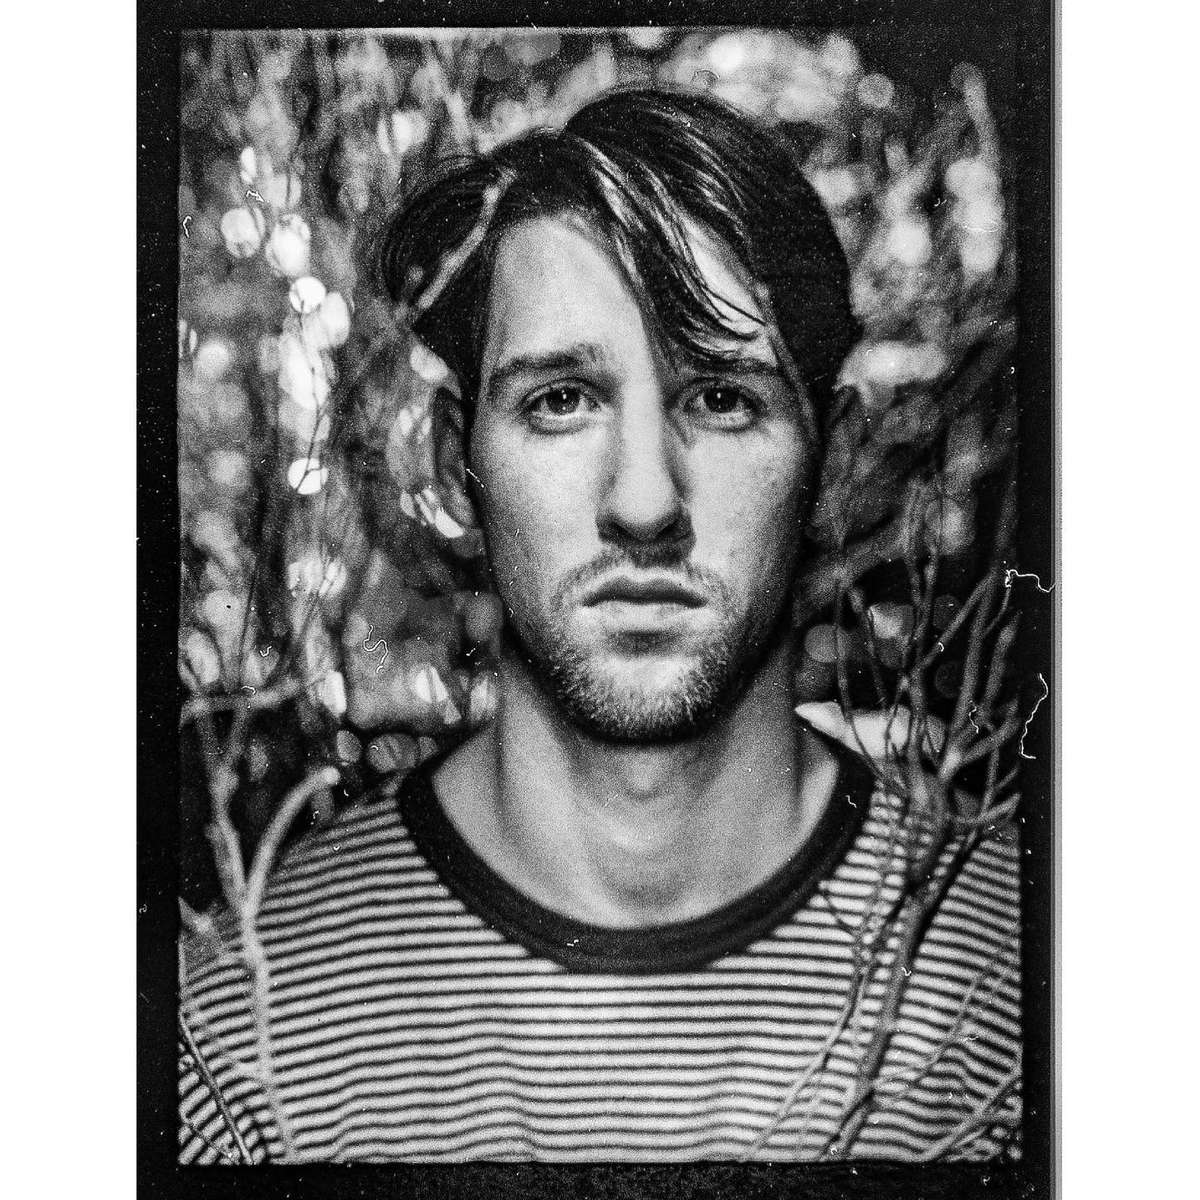 assistant_polaroid-IMG_9708_frank_veronsky